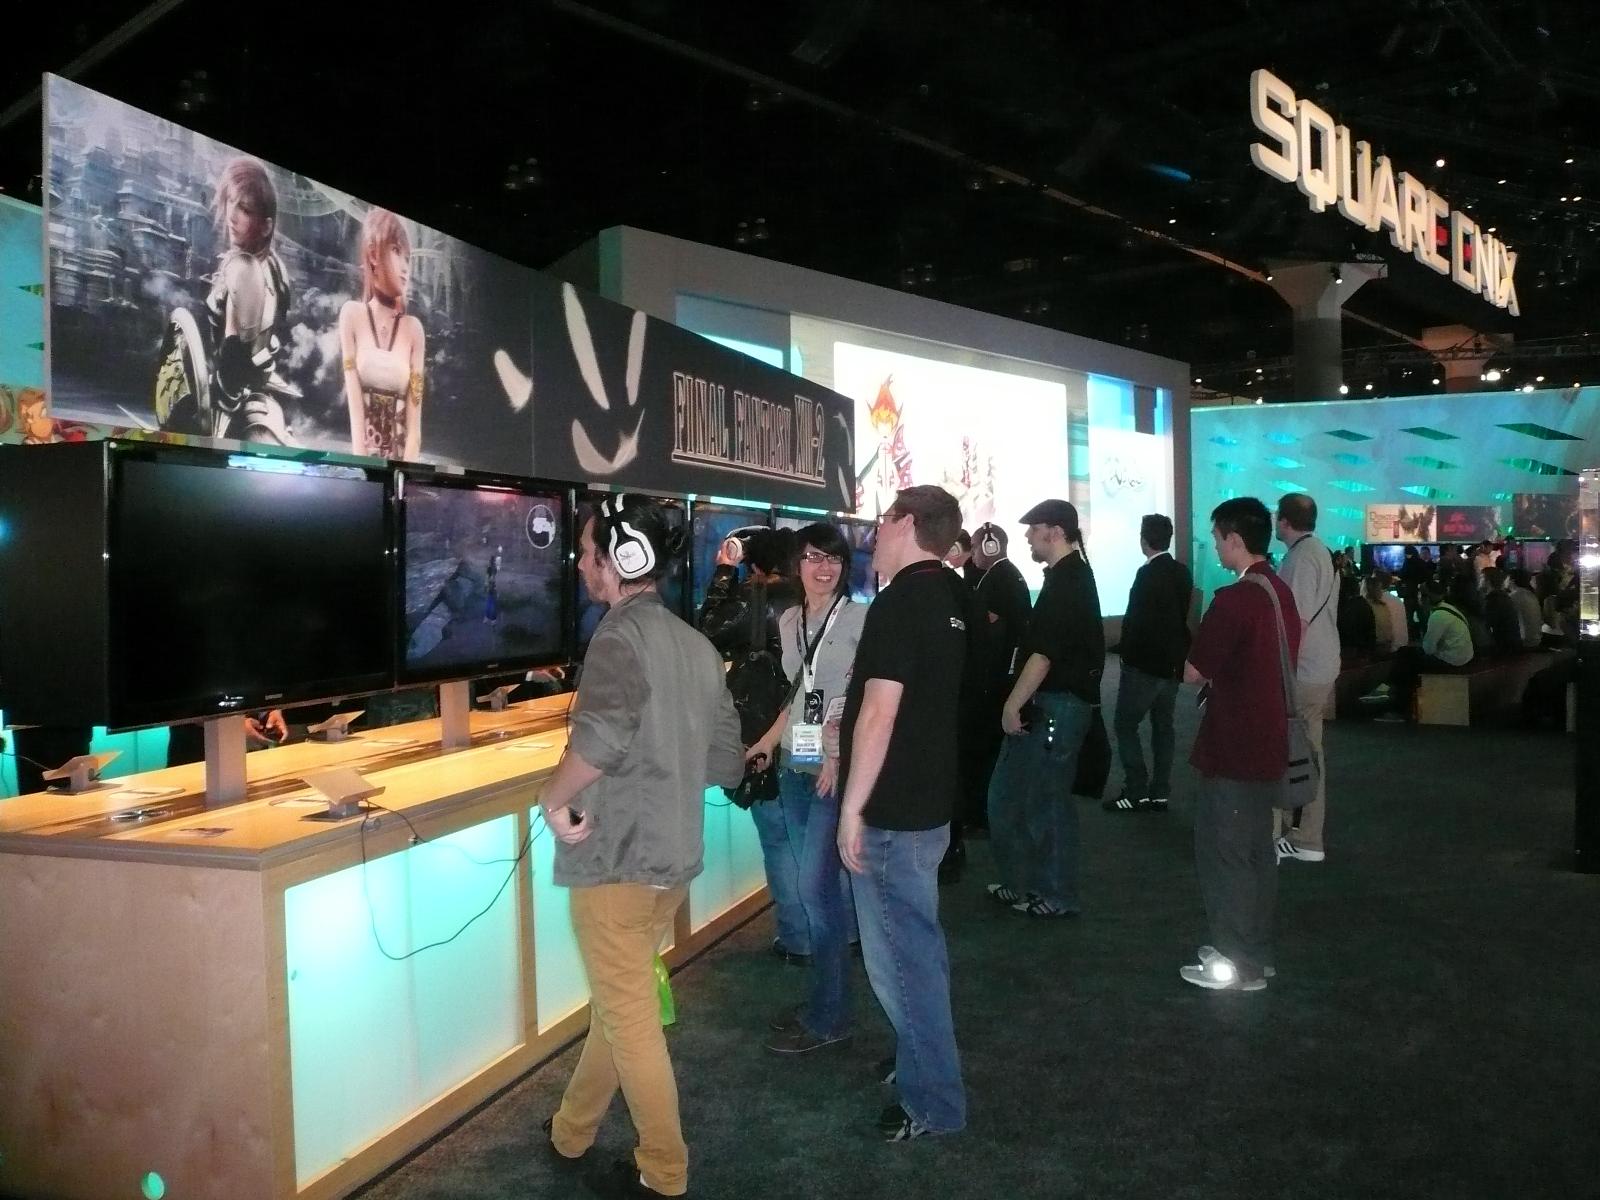 E3 Expo に行ってきました! の巻